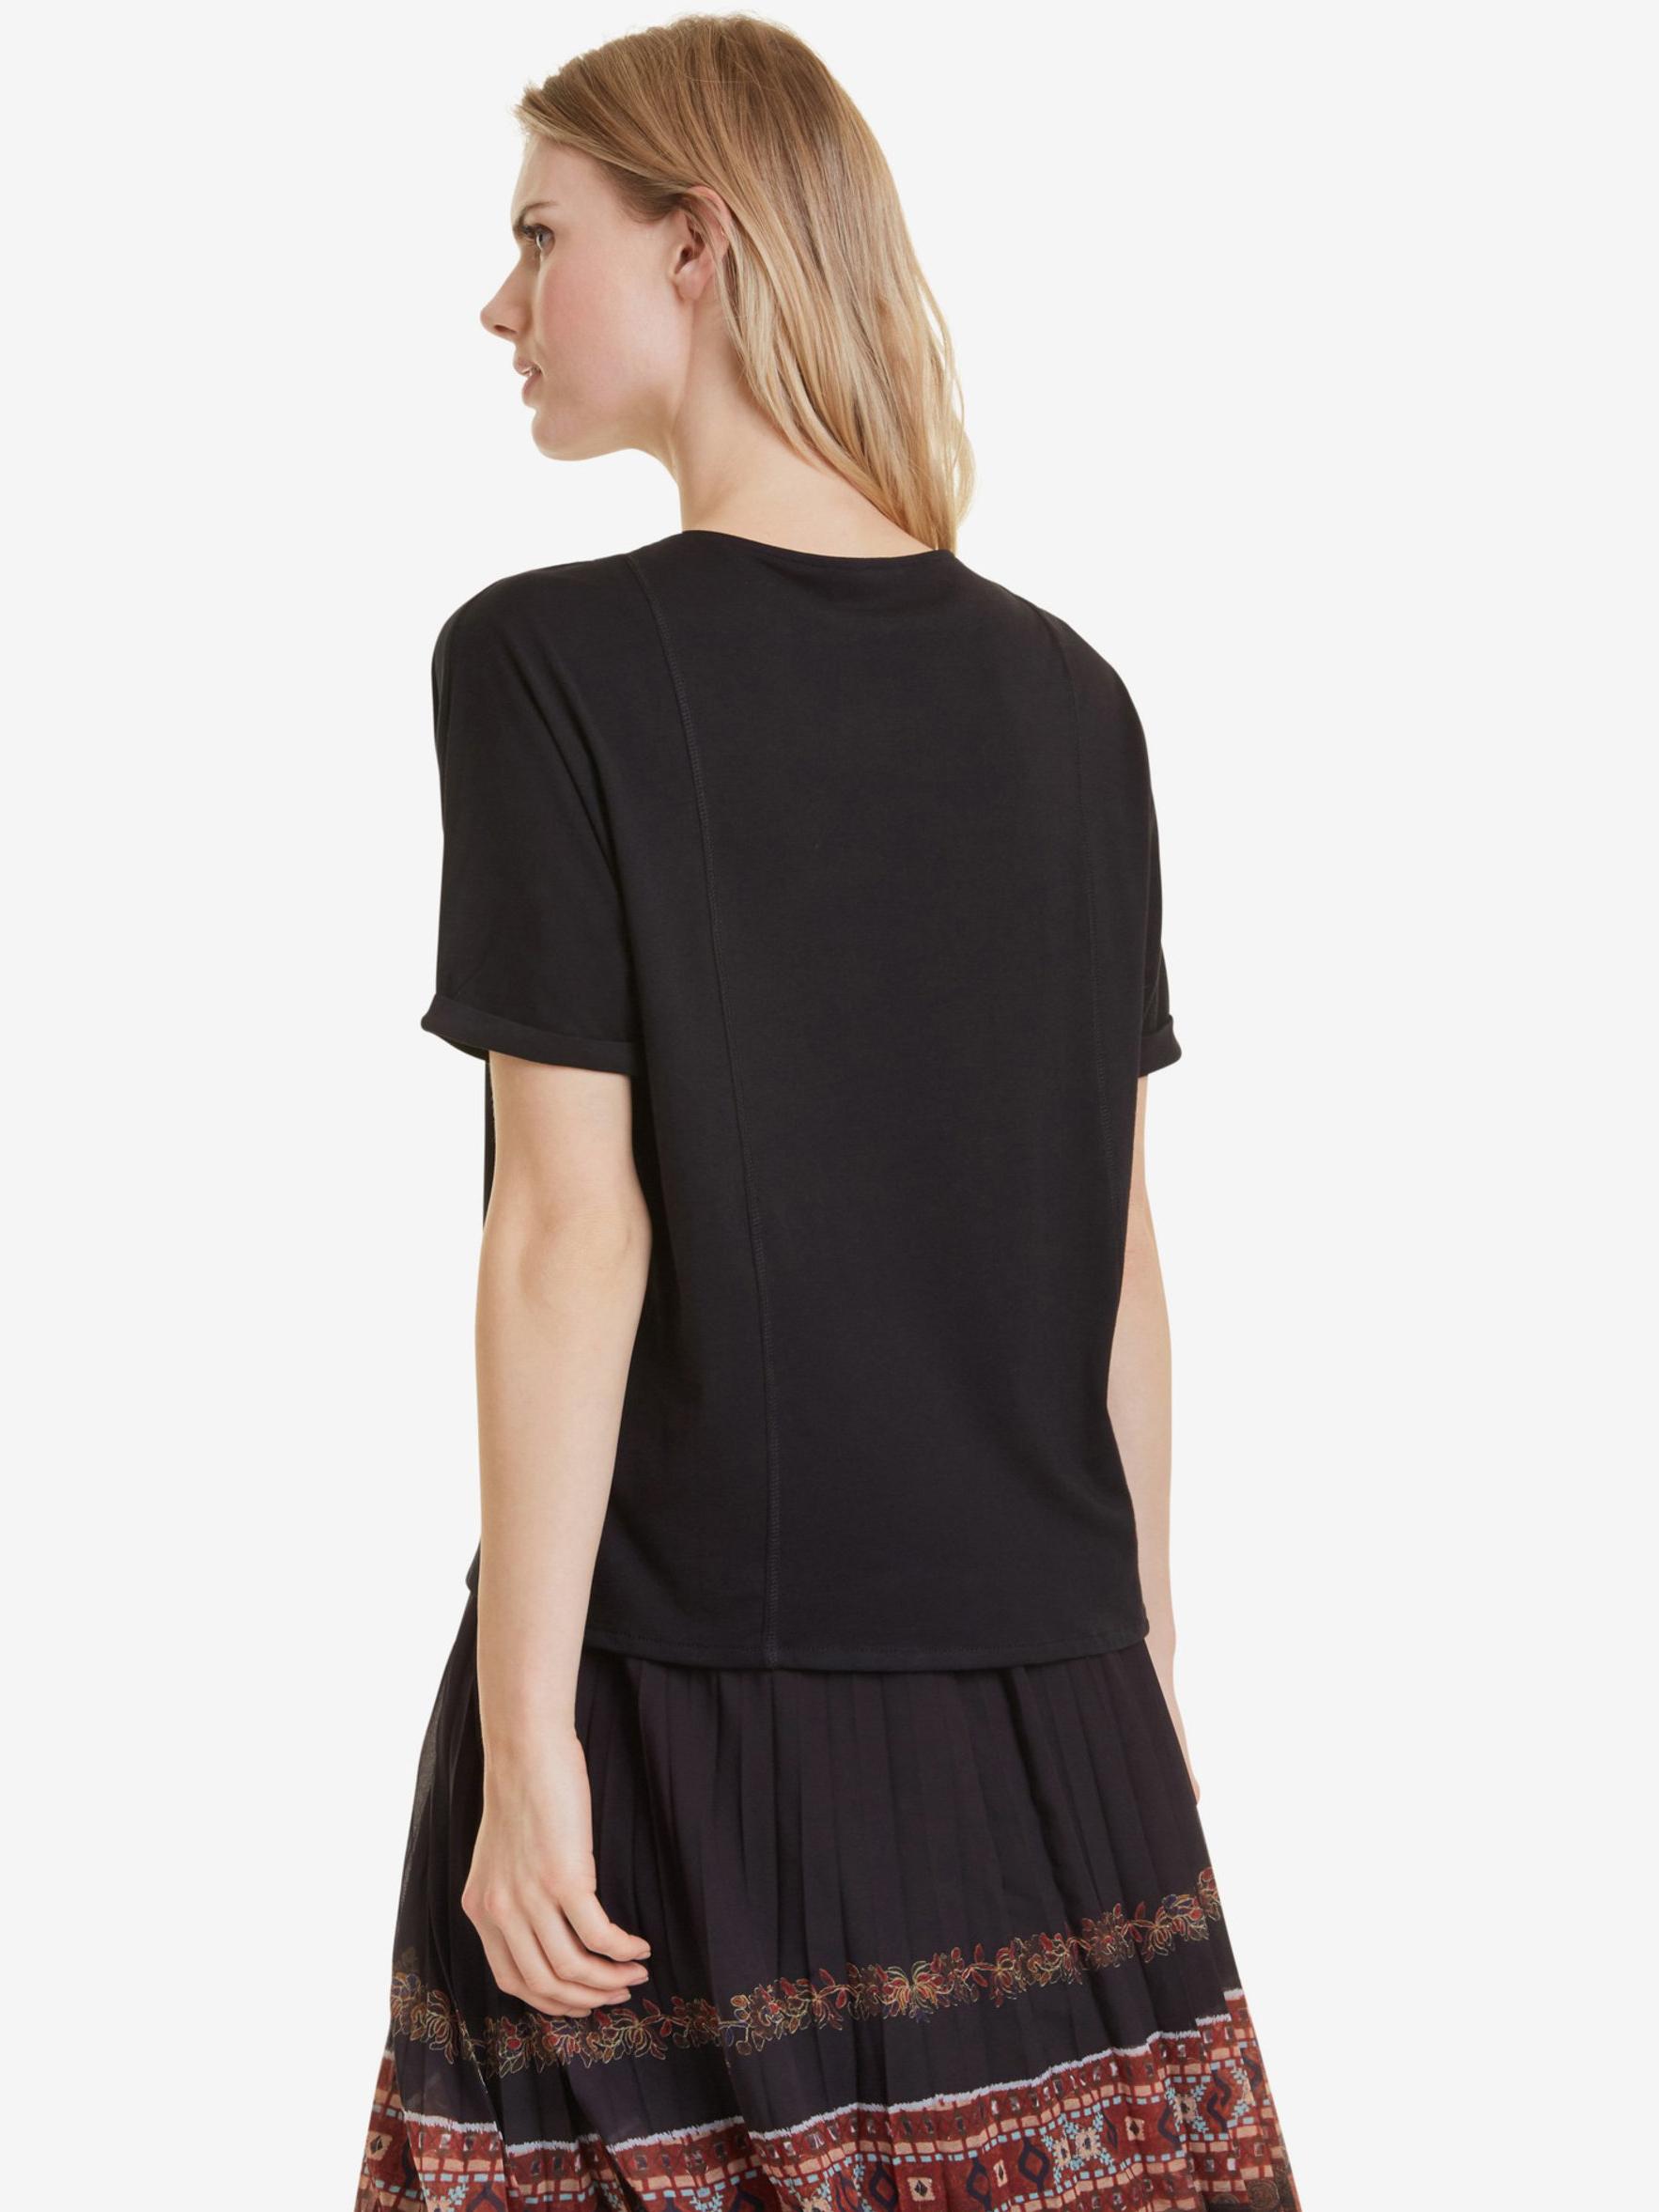 Desigual Women's t-shirt black Triko